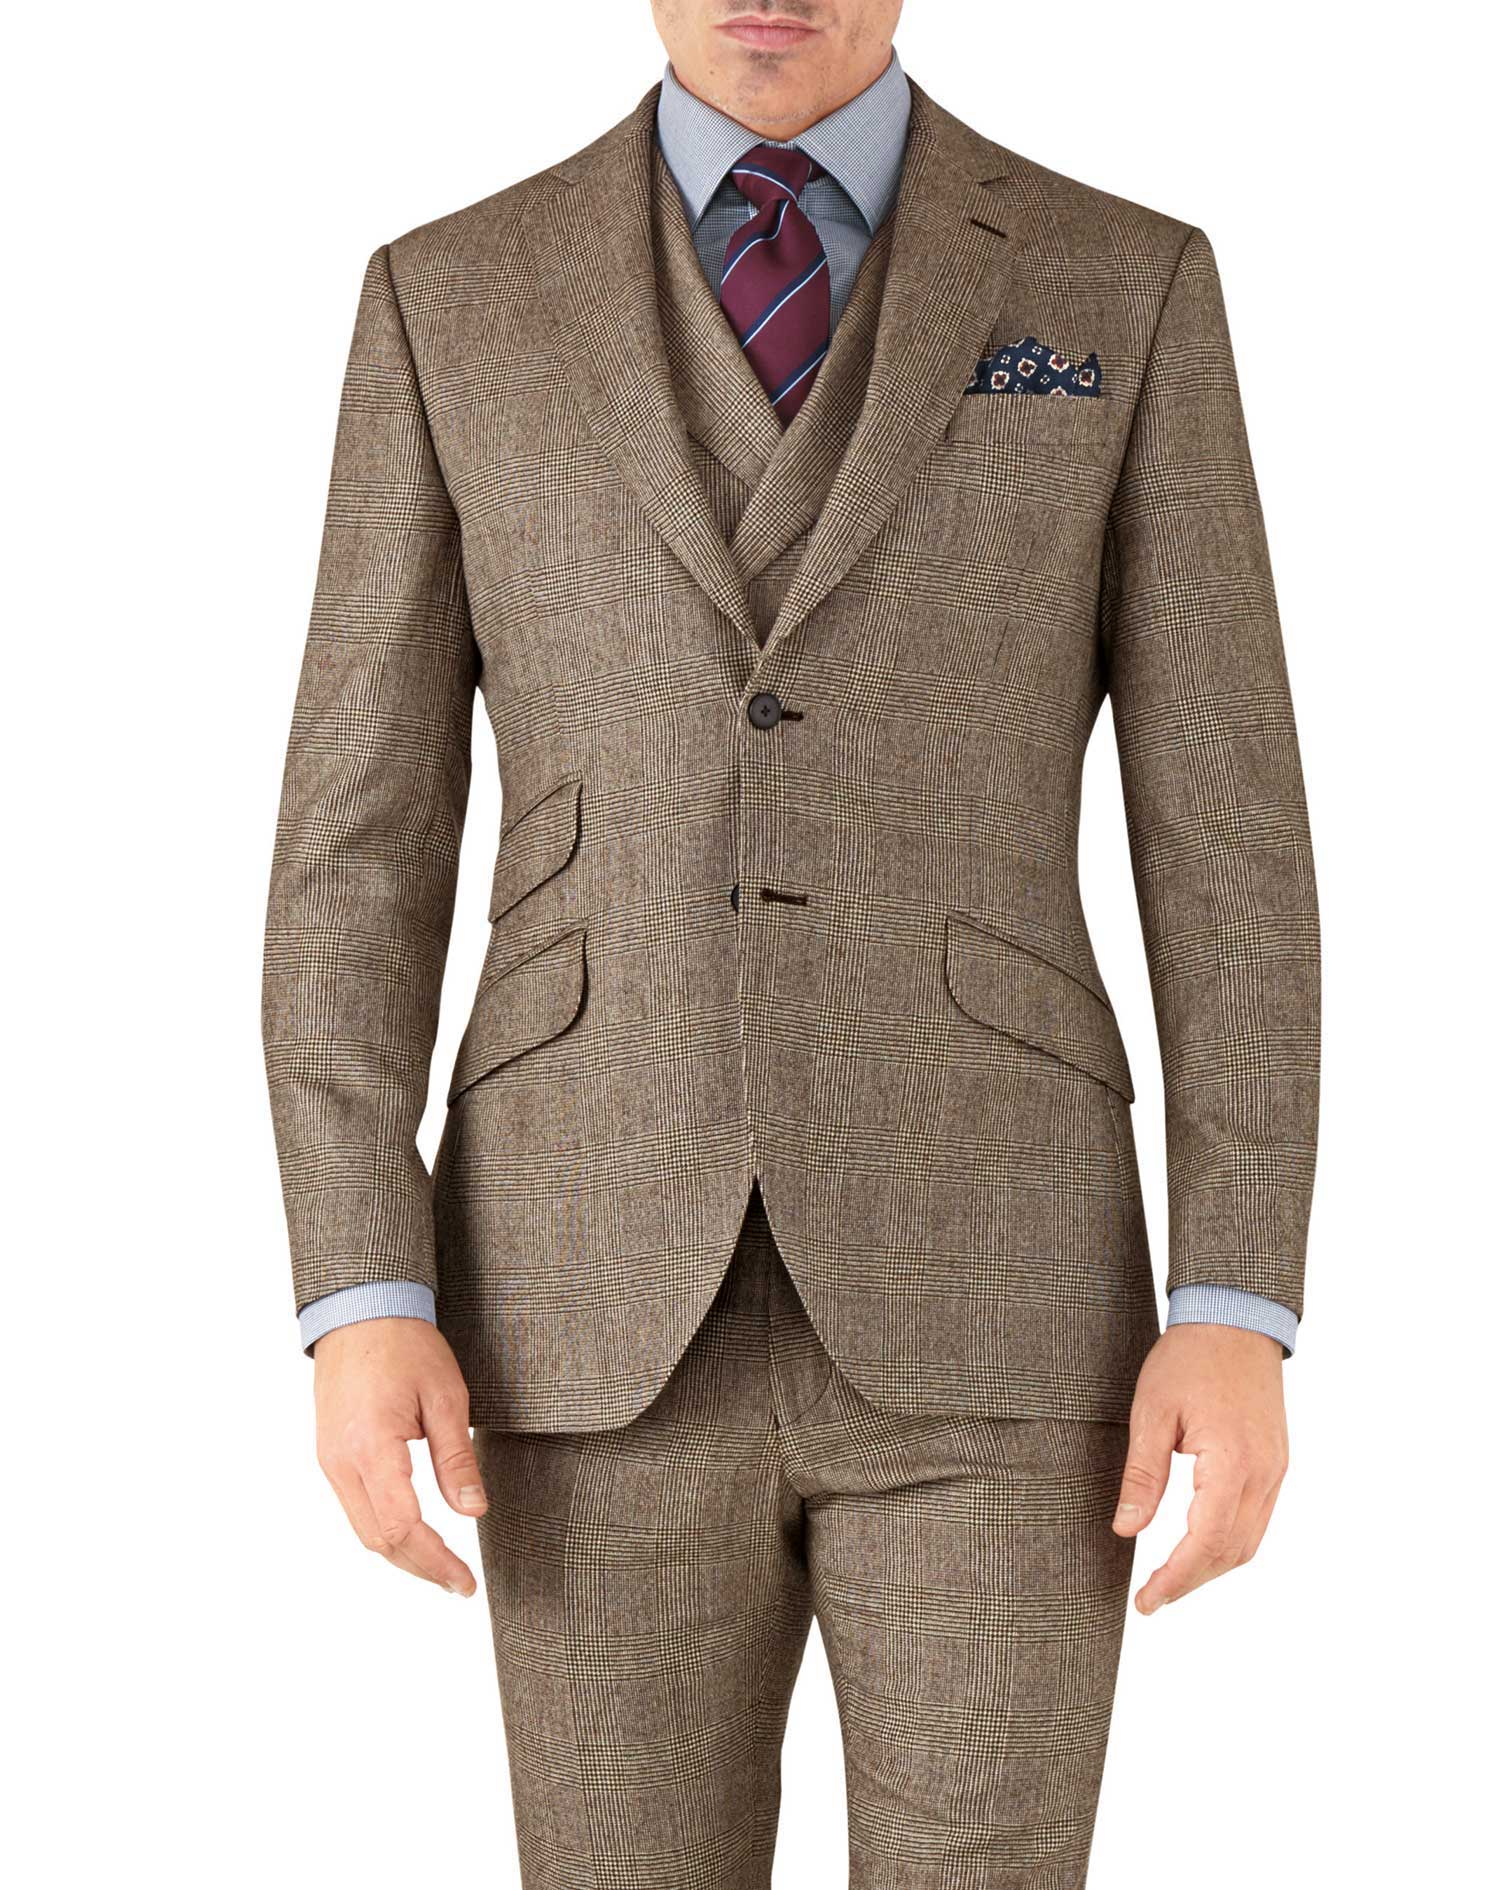 Tan Check Slim Fit British Serge Luxury Suit Wool Jacket Size 36 Regular by Charles Tyrwhitt